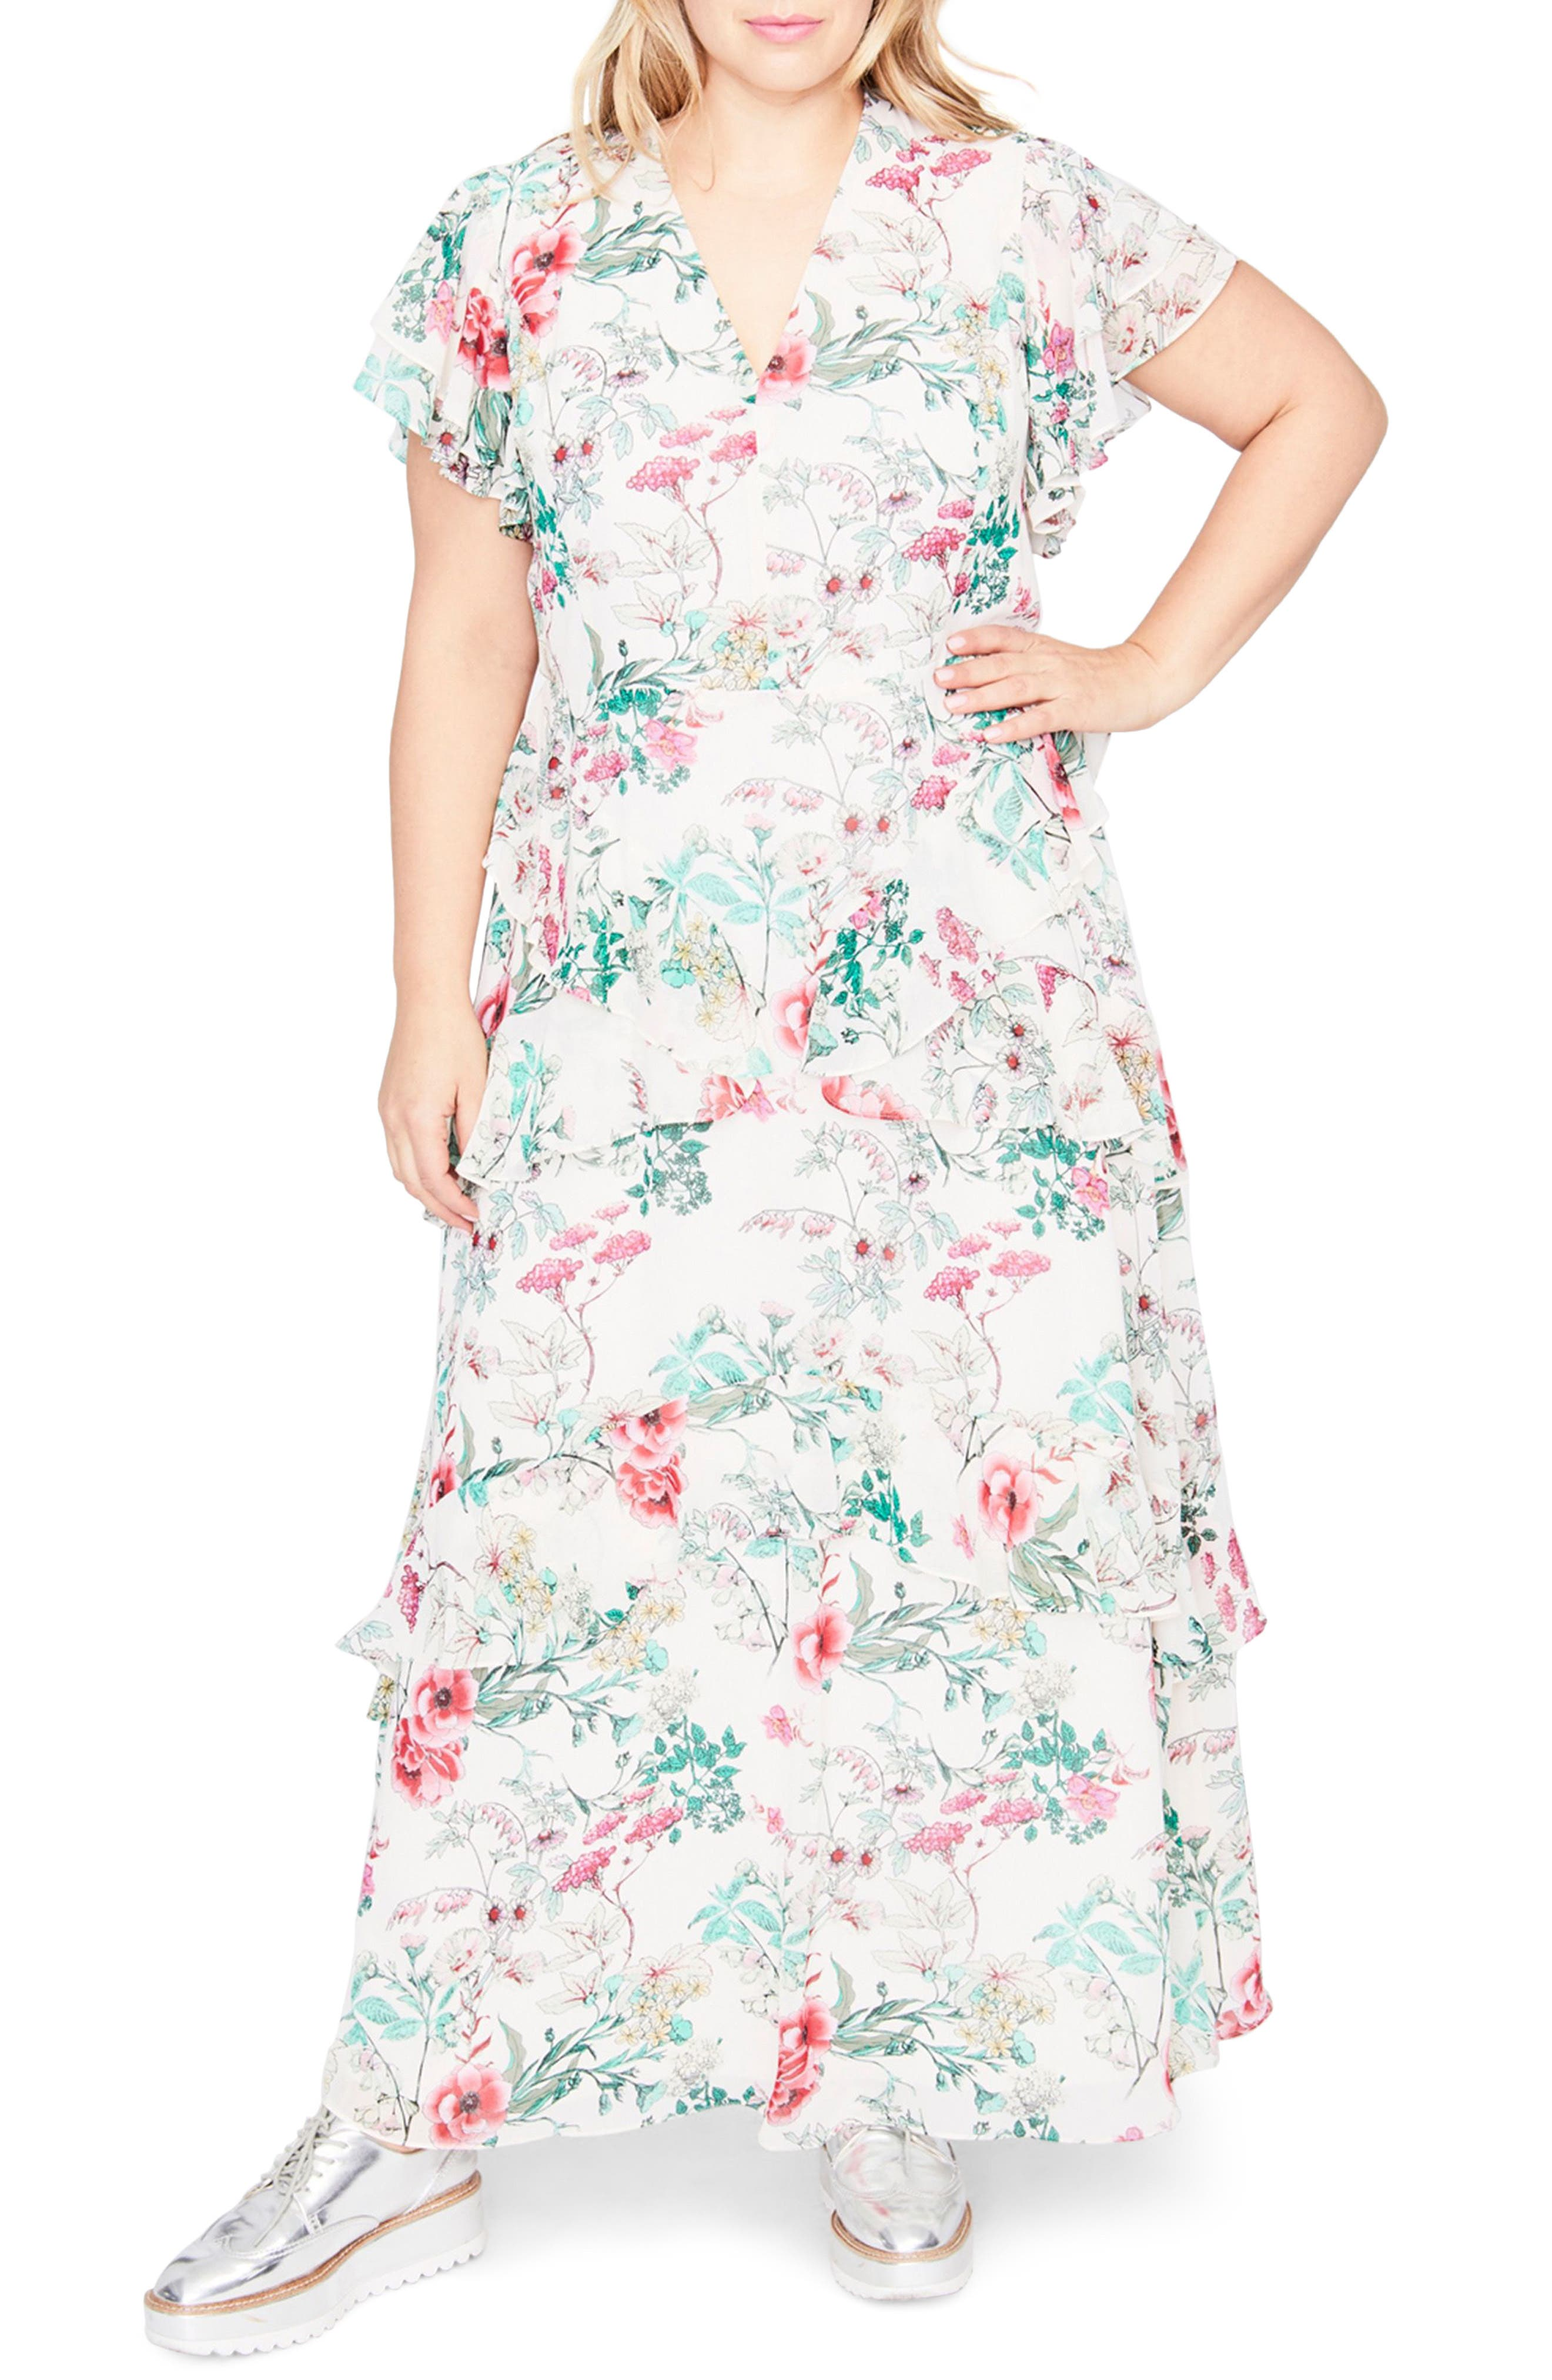 Ruffle Floral Maxi Dress,                         Main,                         color, Almond Milk Combo